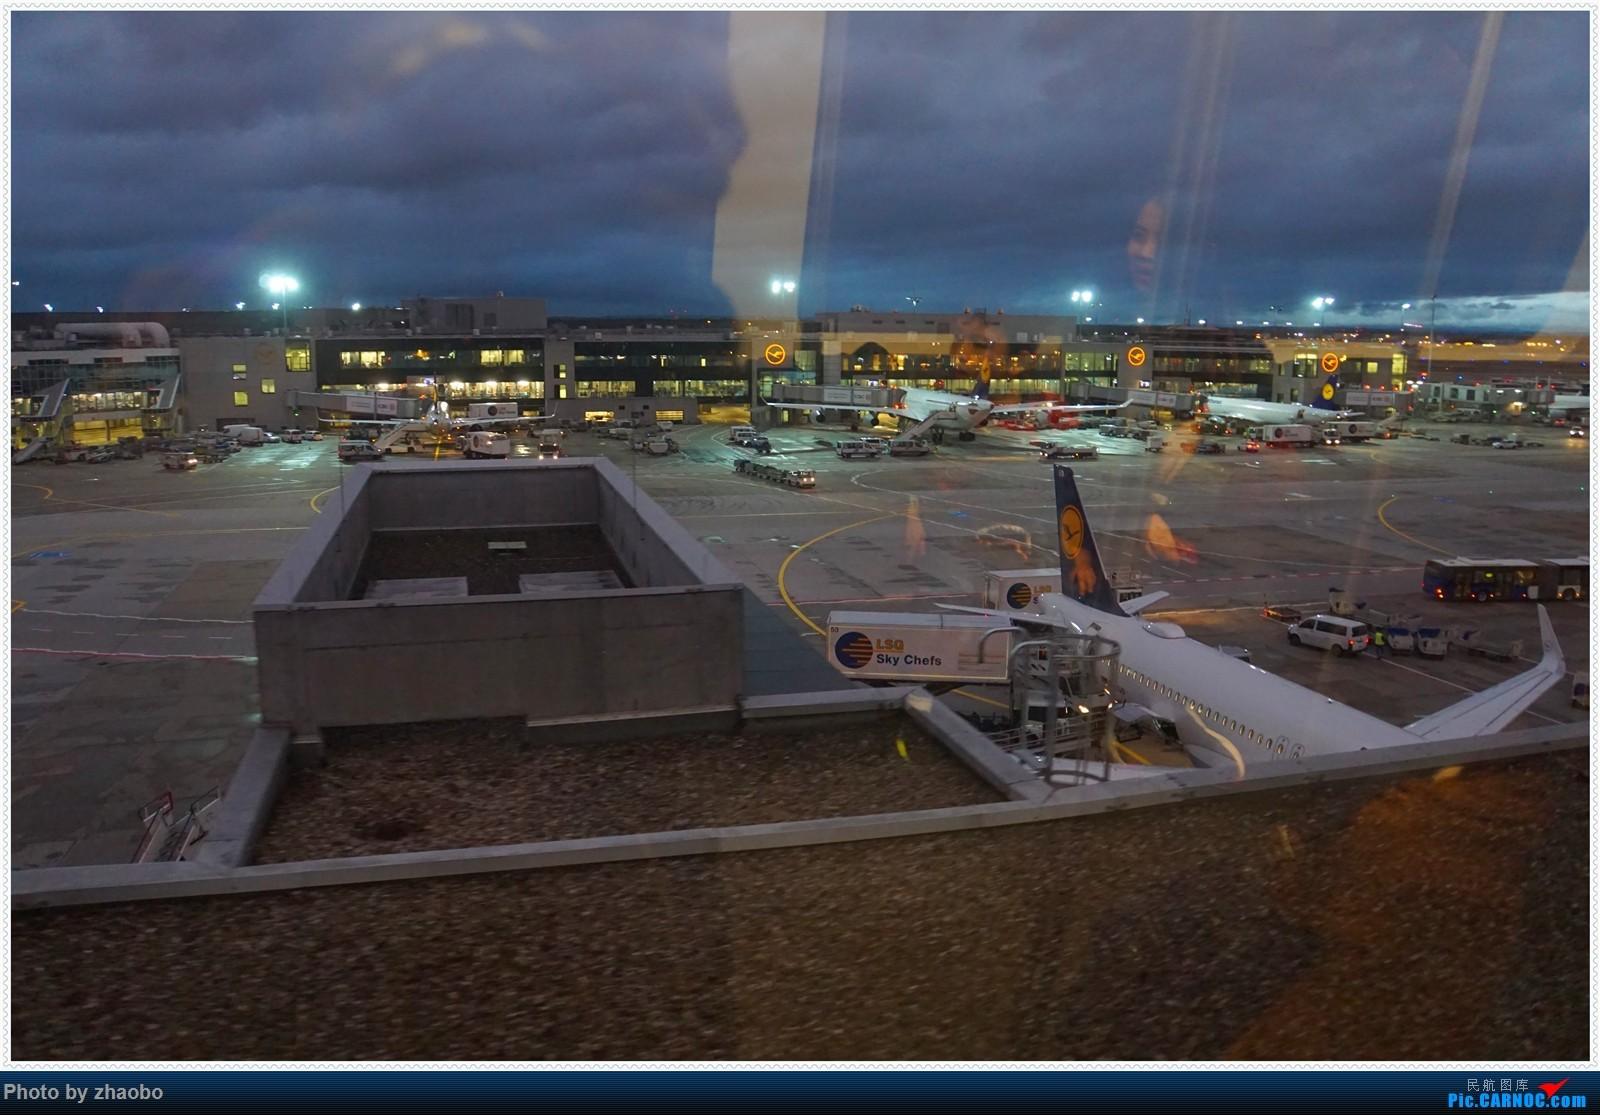 Re:从南到北游英伦-我的星空之旅,汉莎航空初体验和一点不输给欧洲列强的国航 AIRBUS A330-200